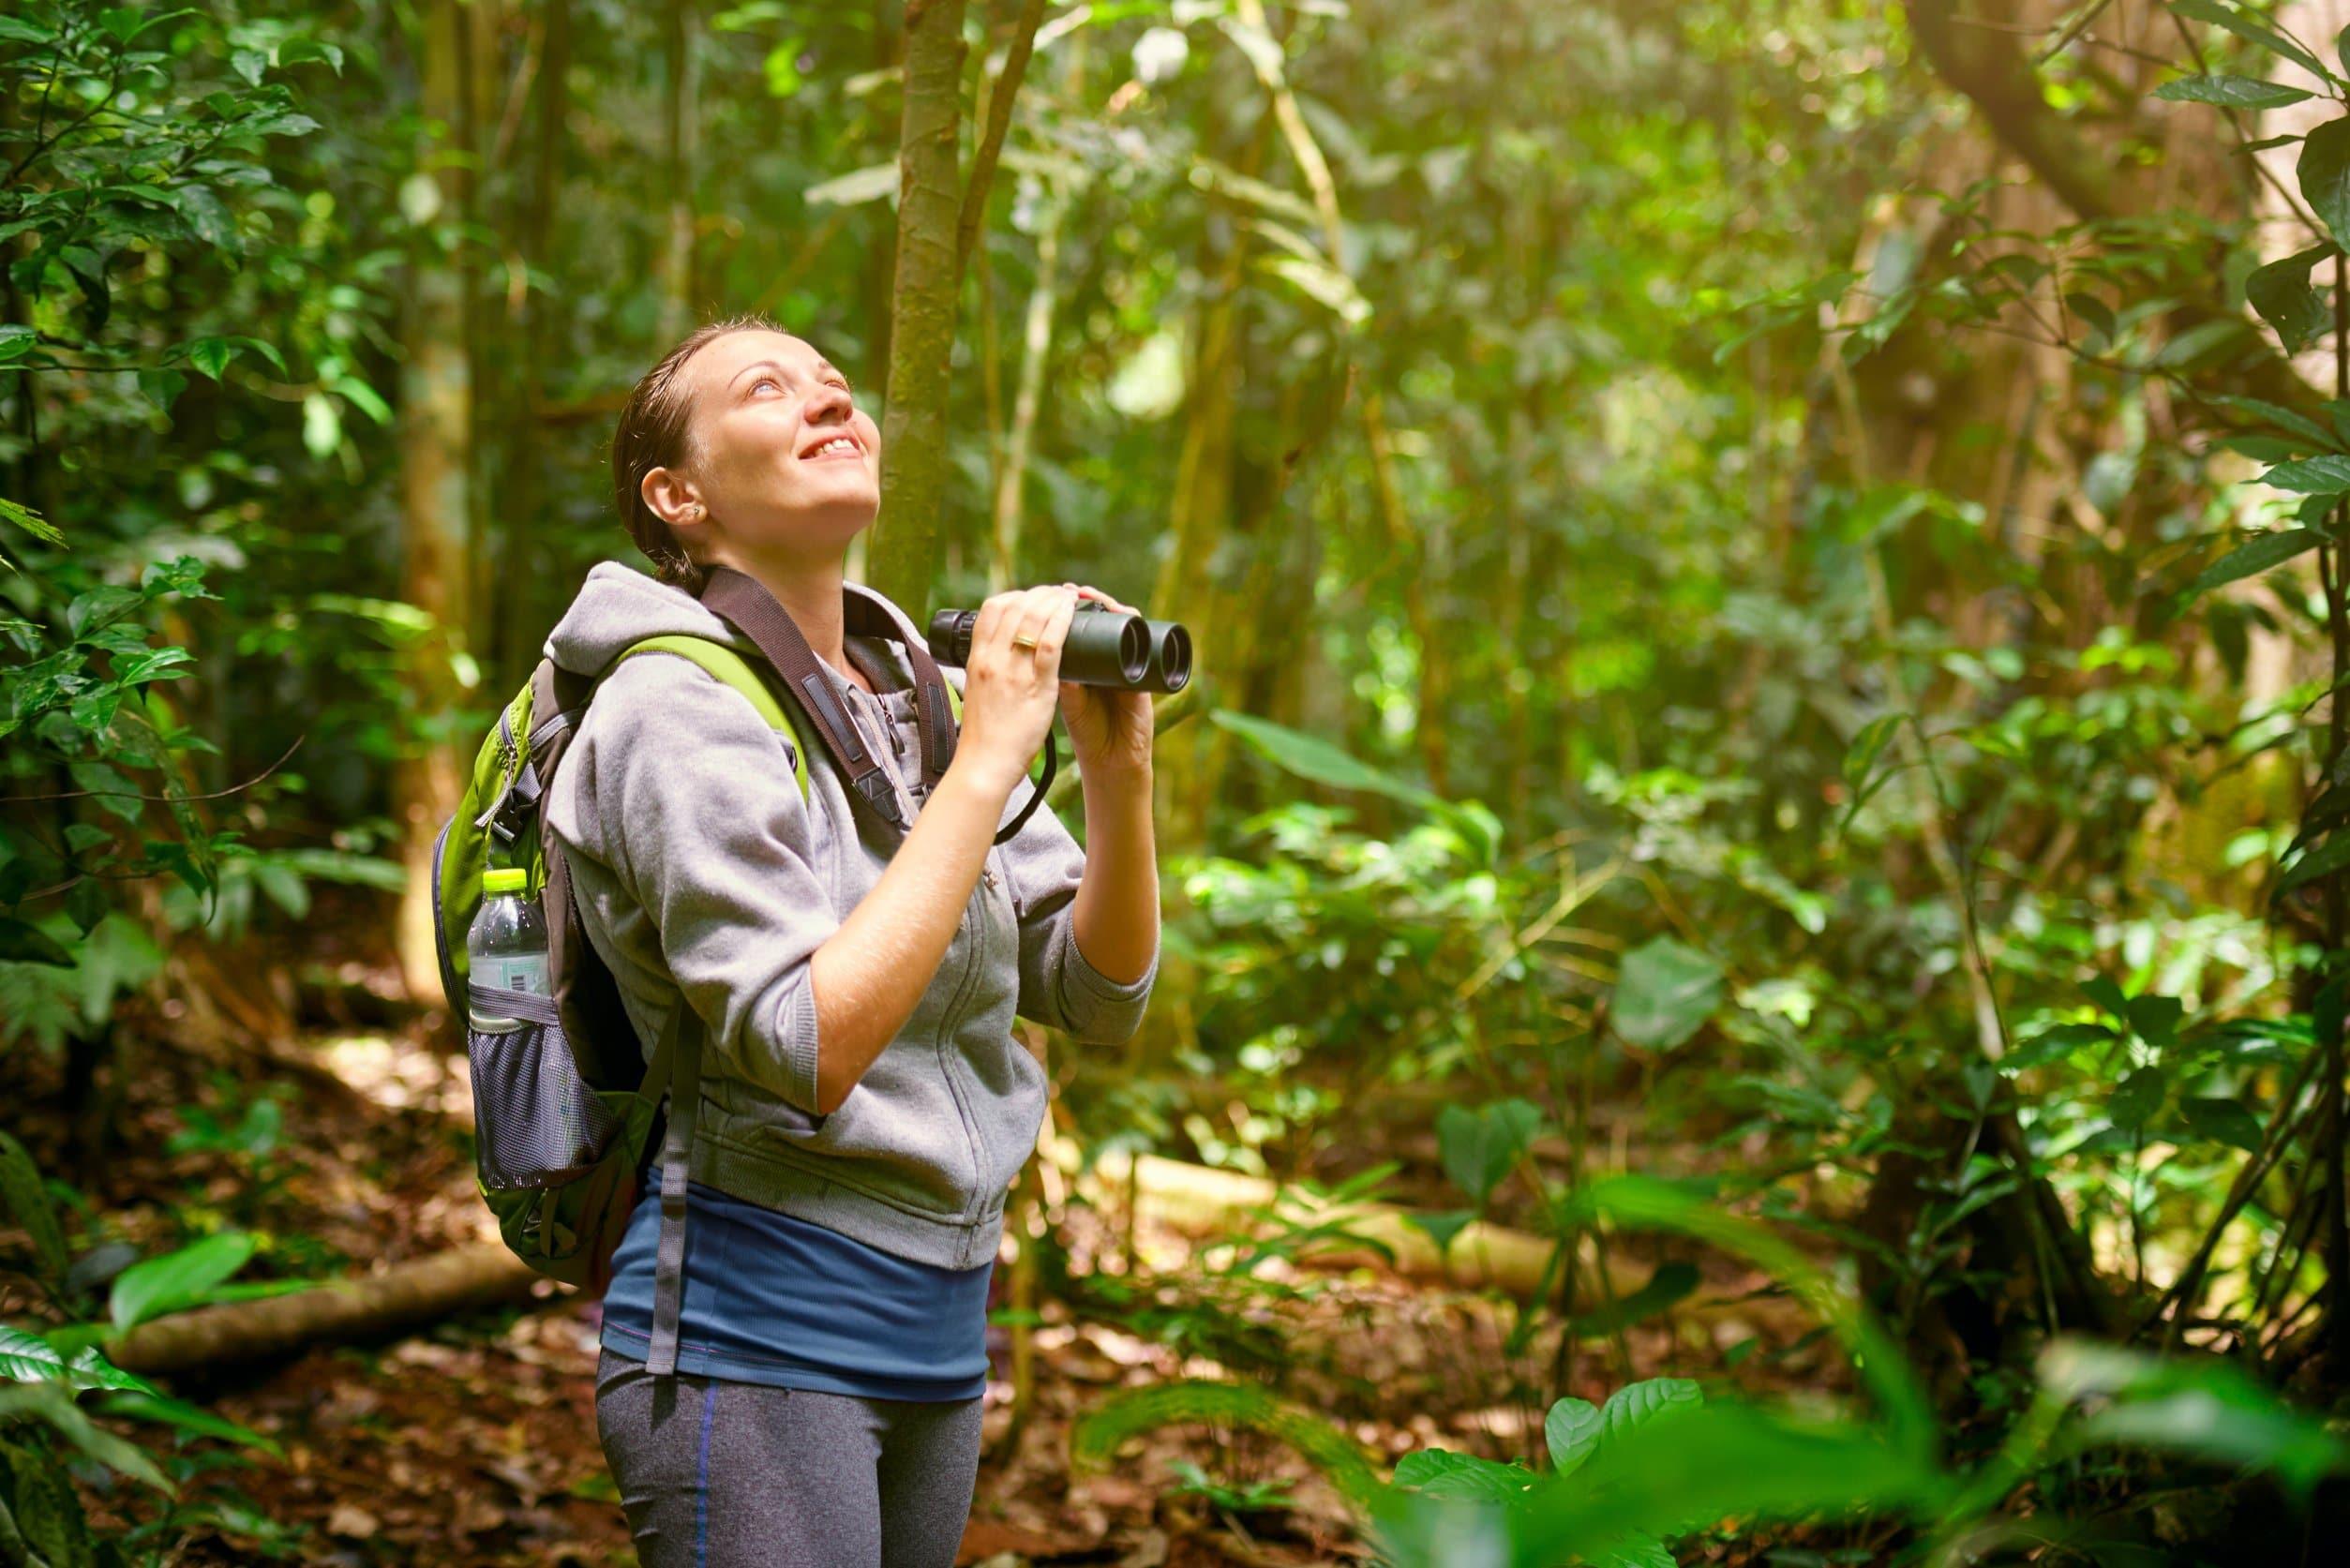 Hiker watching through binoculars wild birds in nature